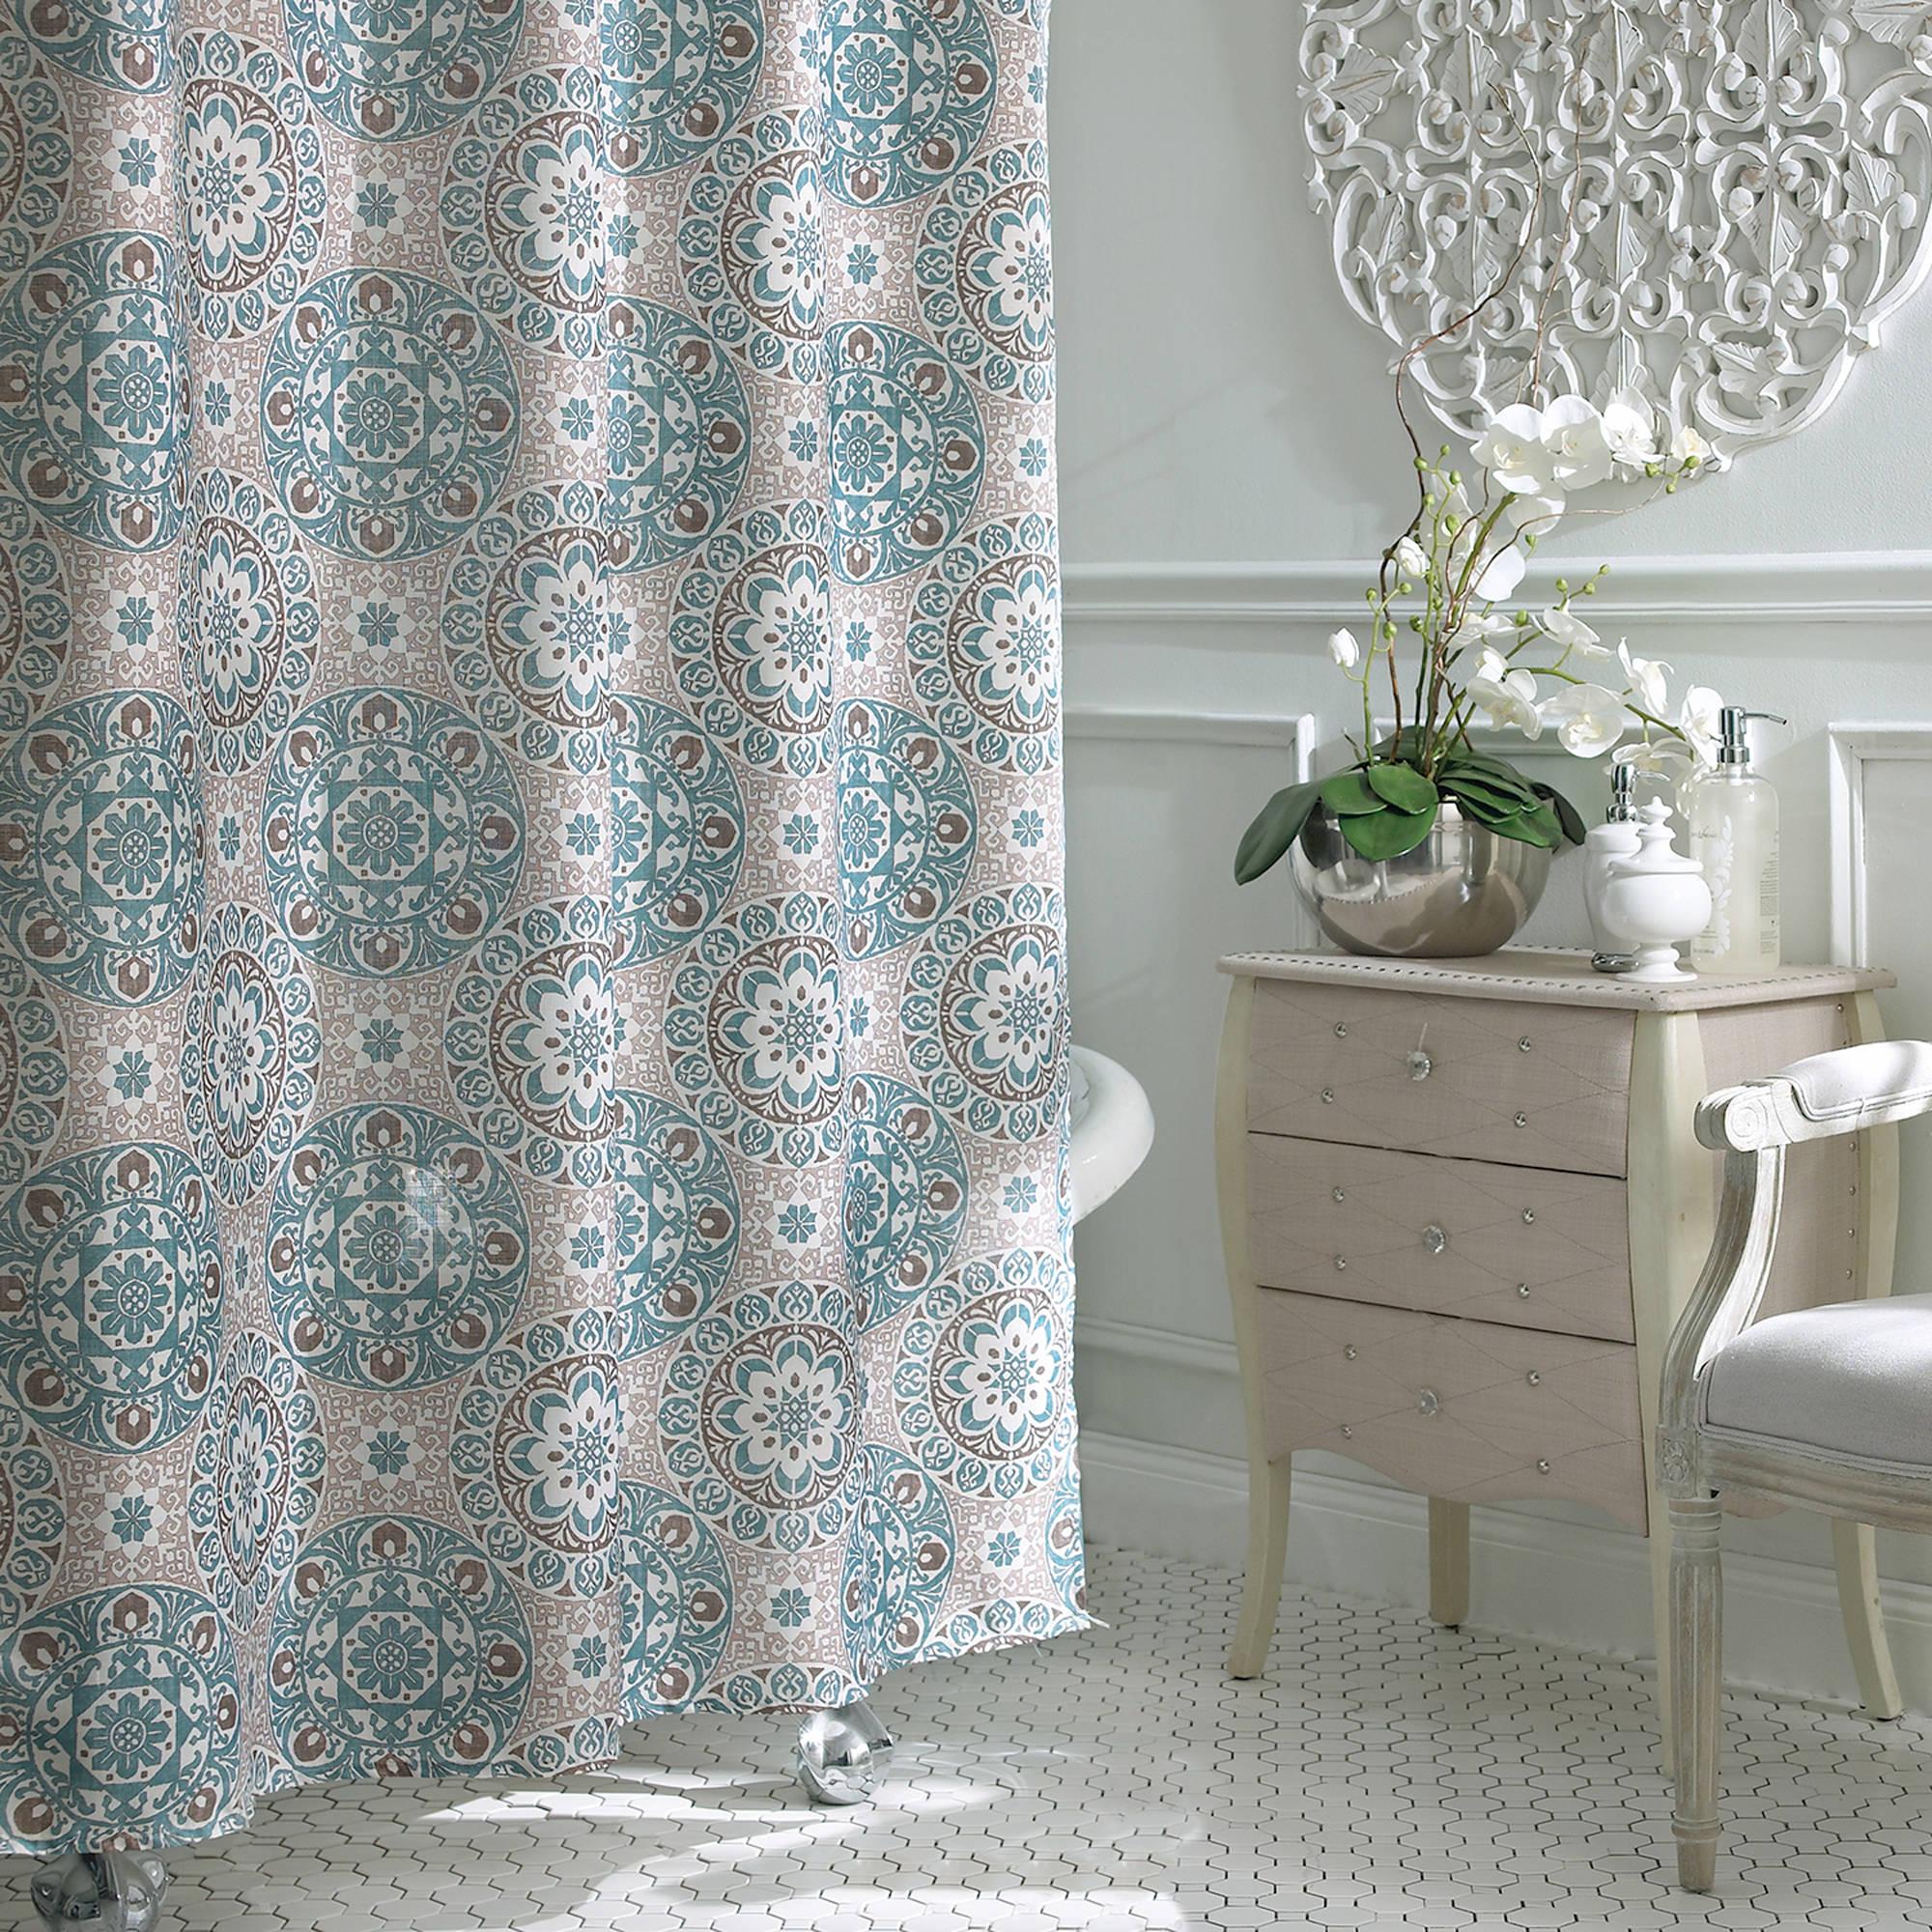 excell carthe fabric shower curtain - walmart